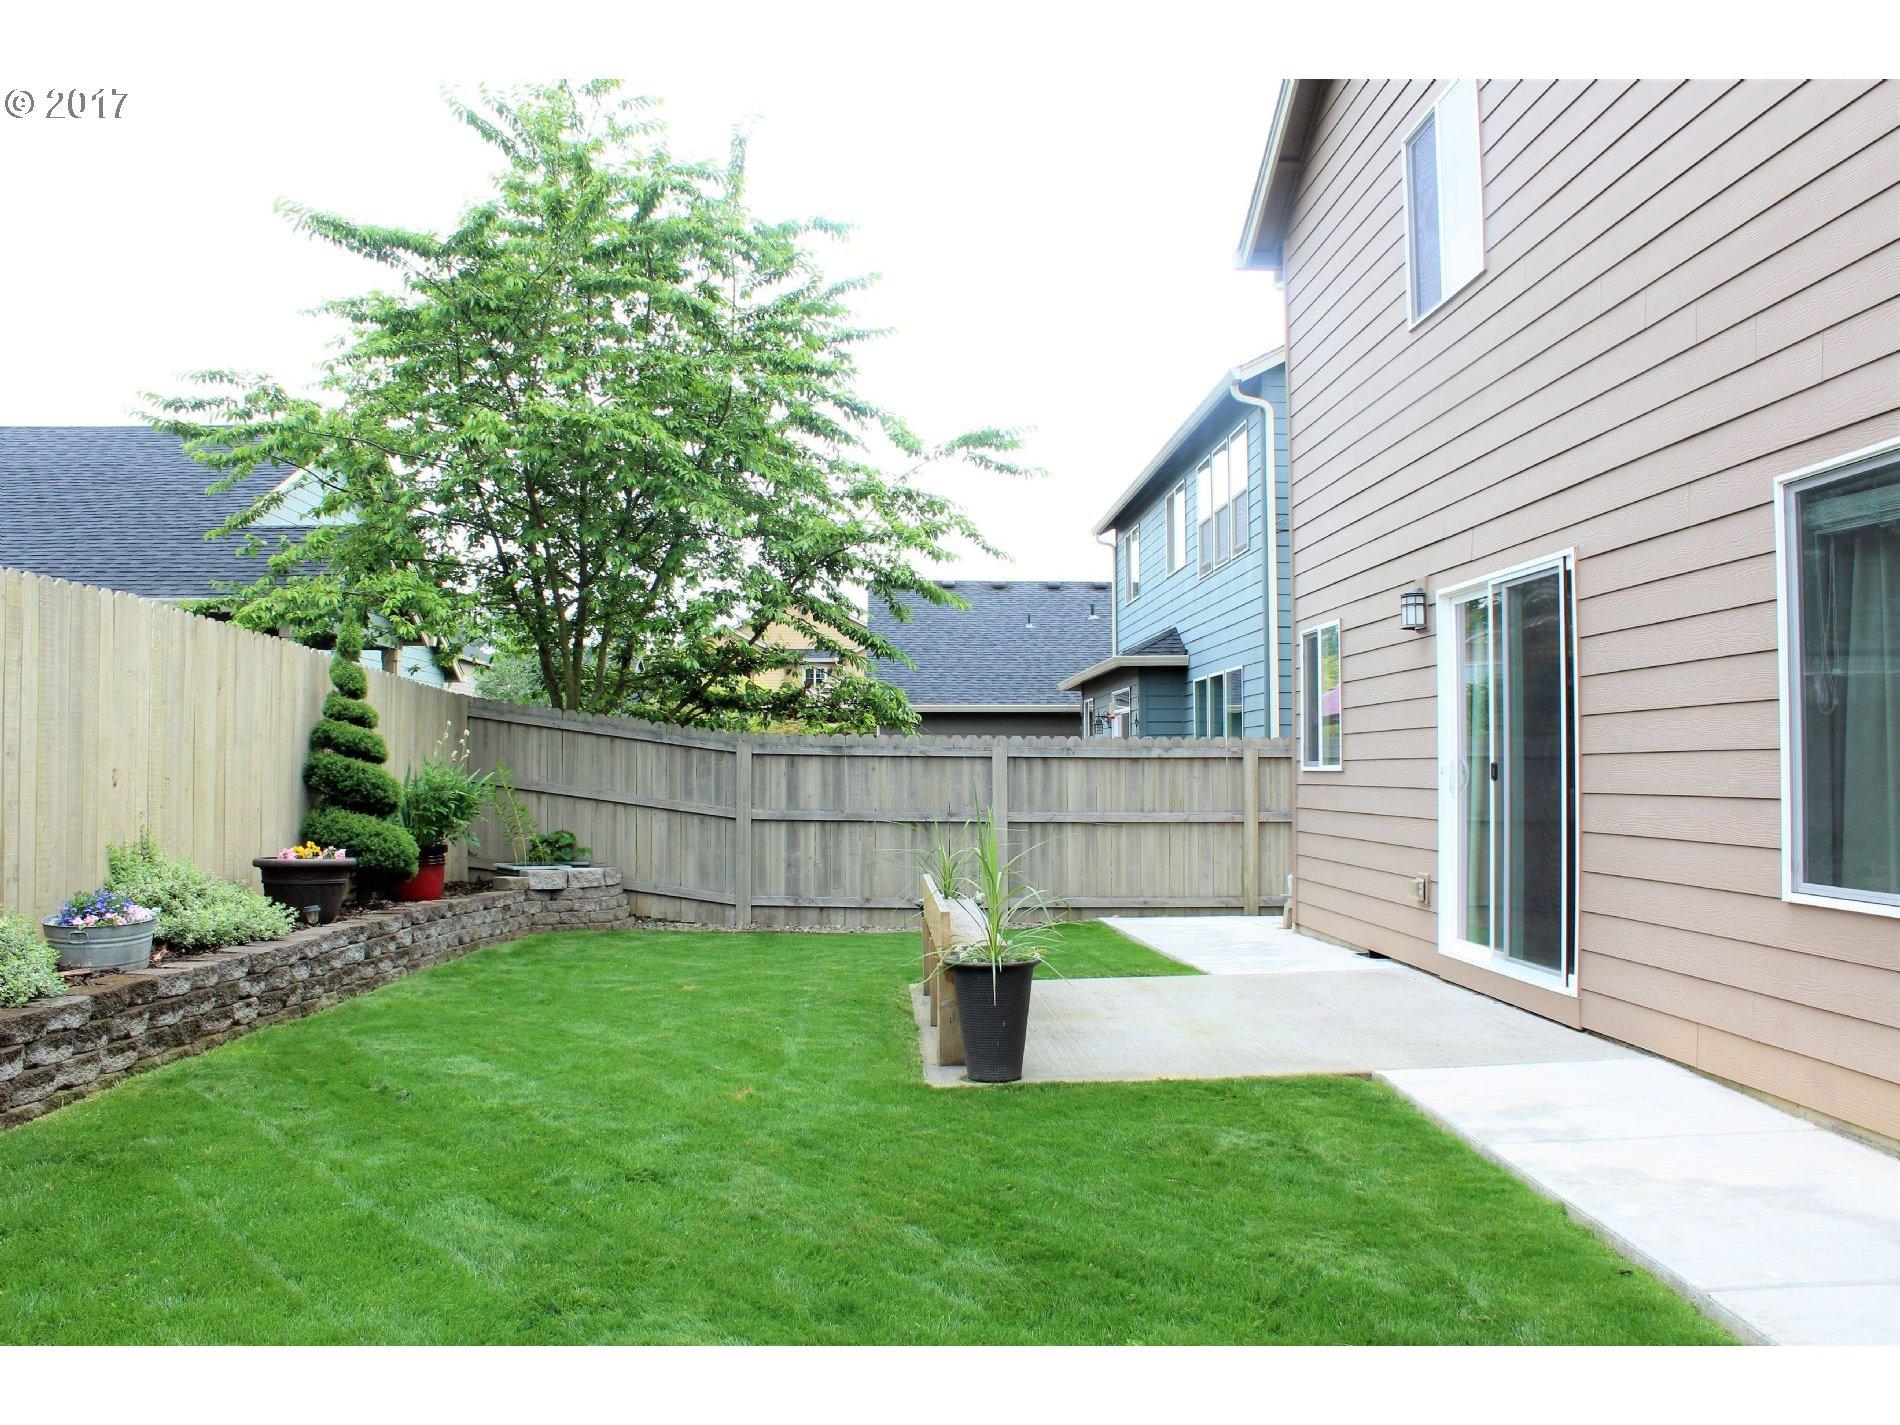 10508 NE 68TH AVE Vancouver, WA 98686 - MLS #: 17604291